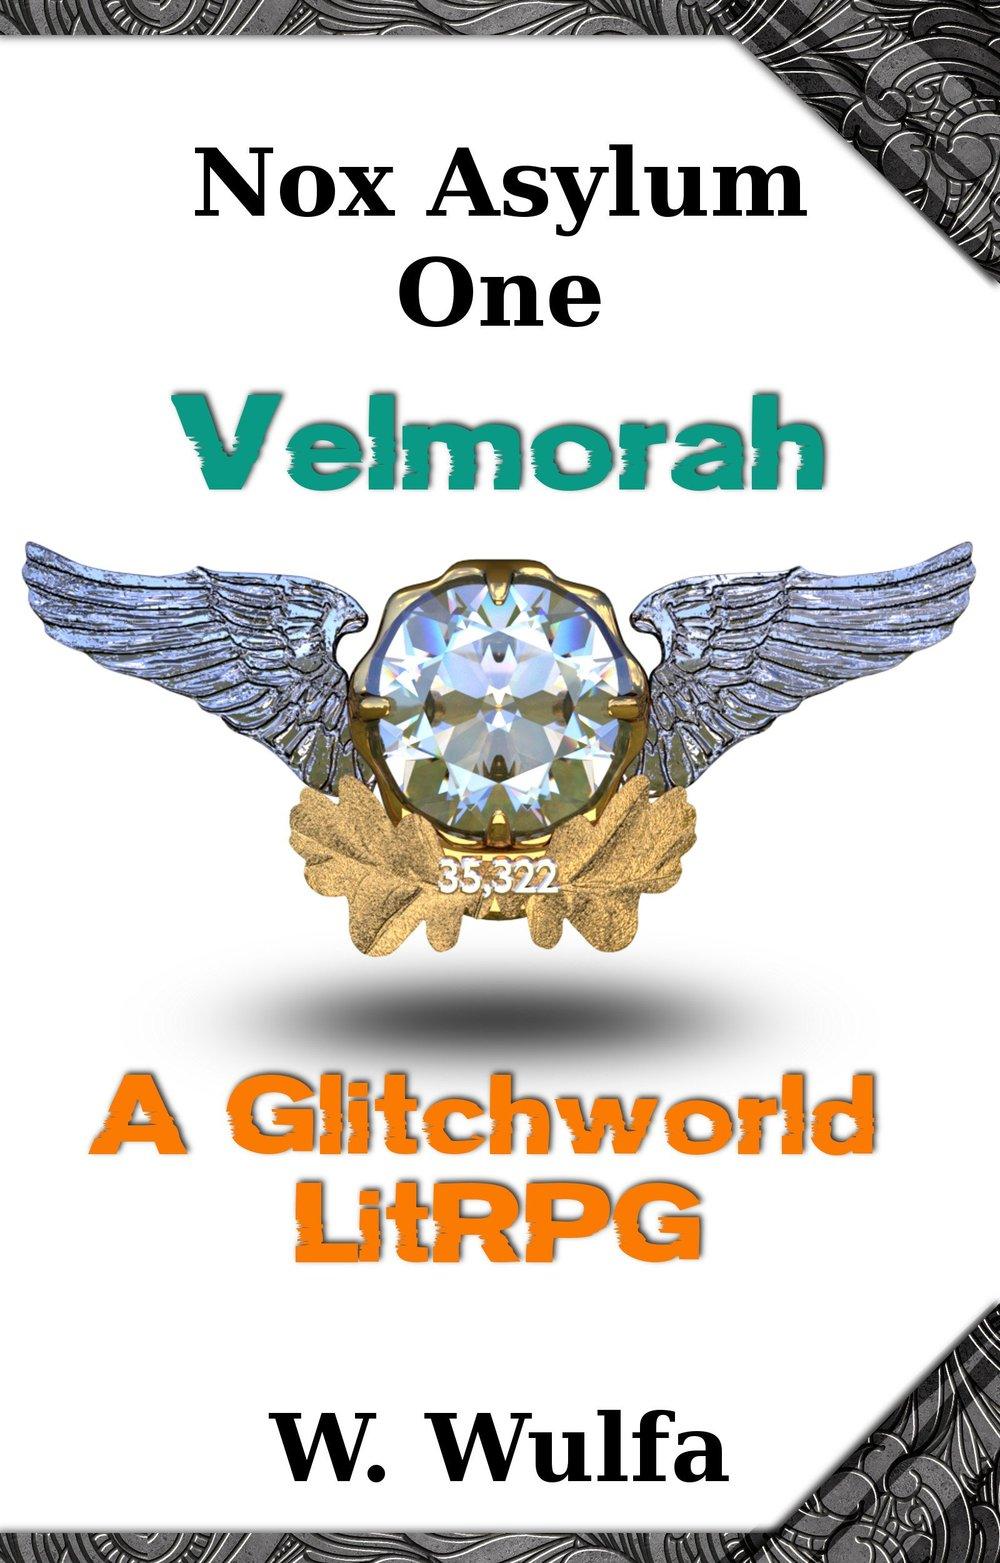 Glitchworld.jpg